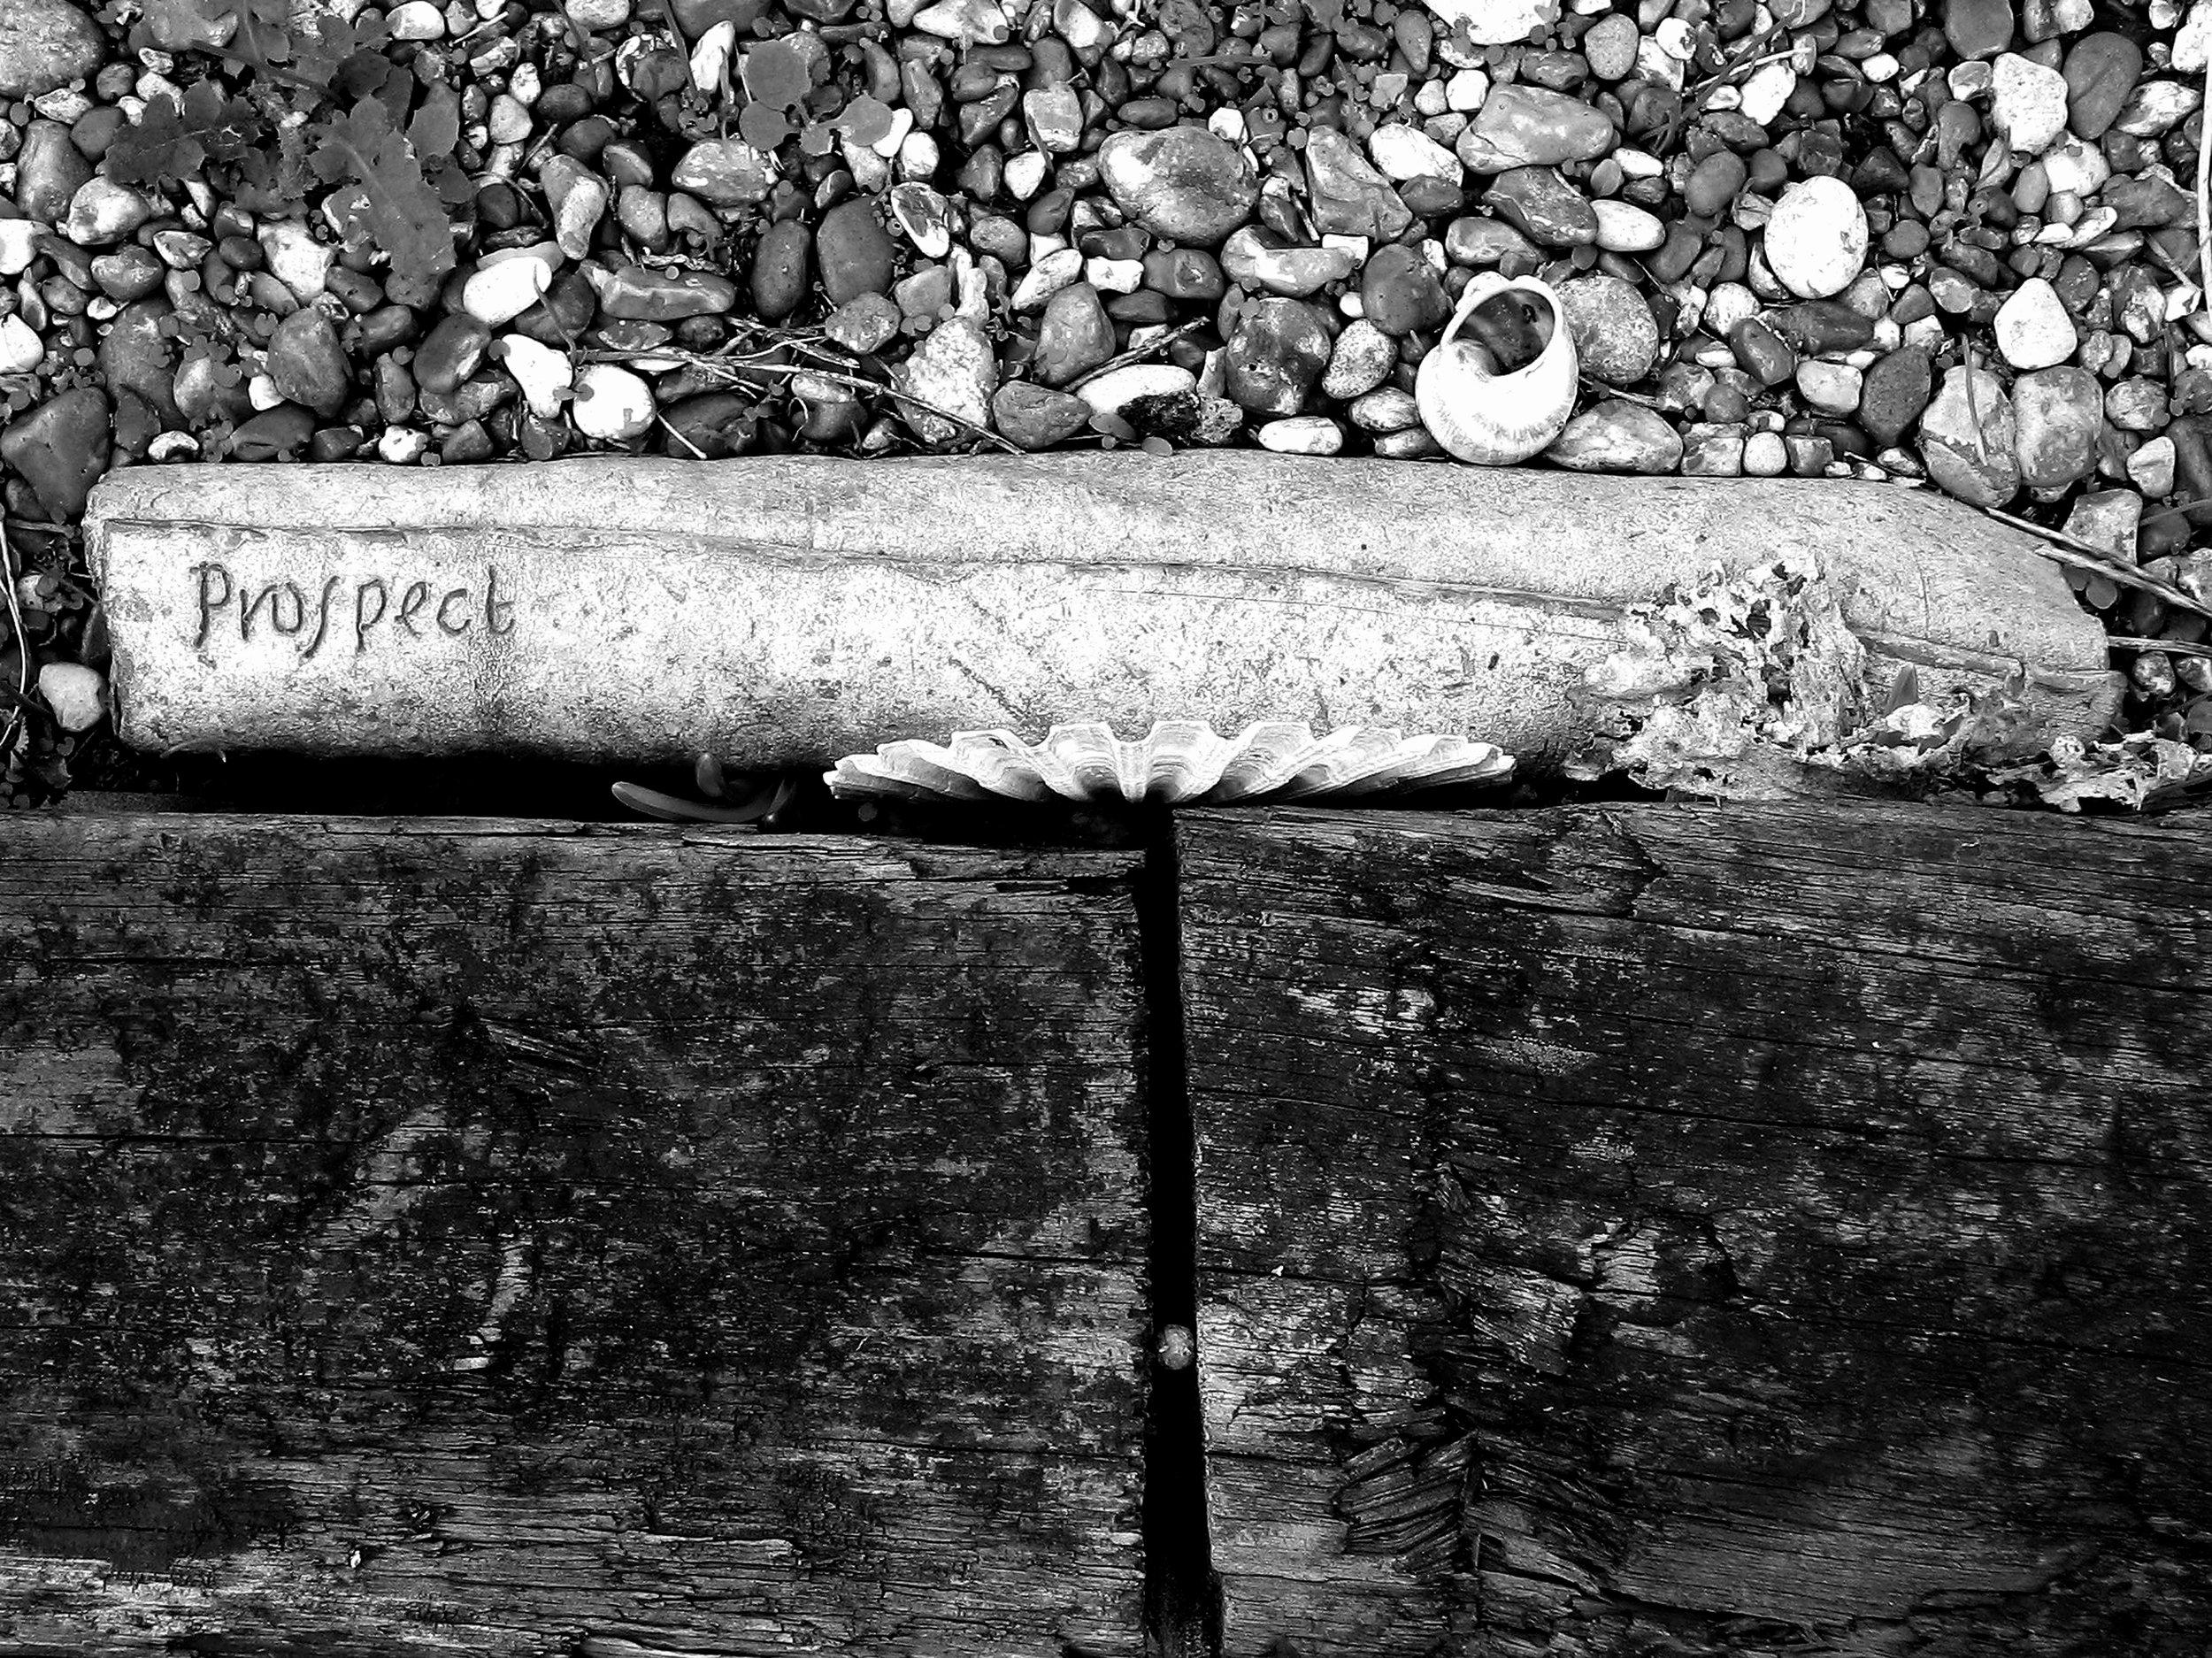 Prospect-stone_2006.jpg